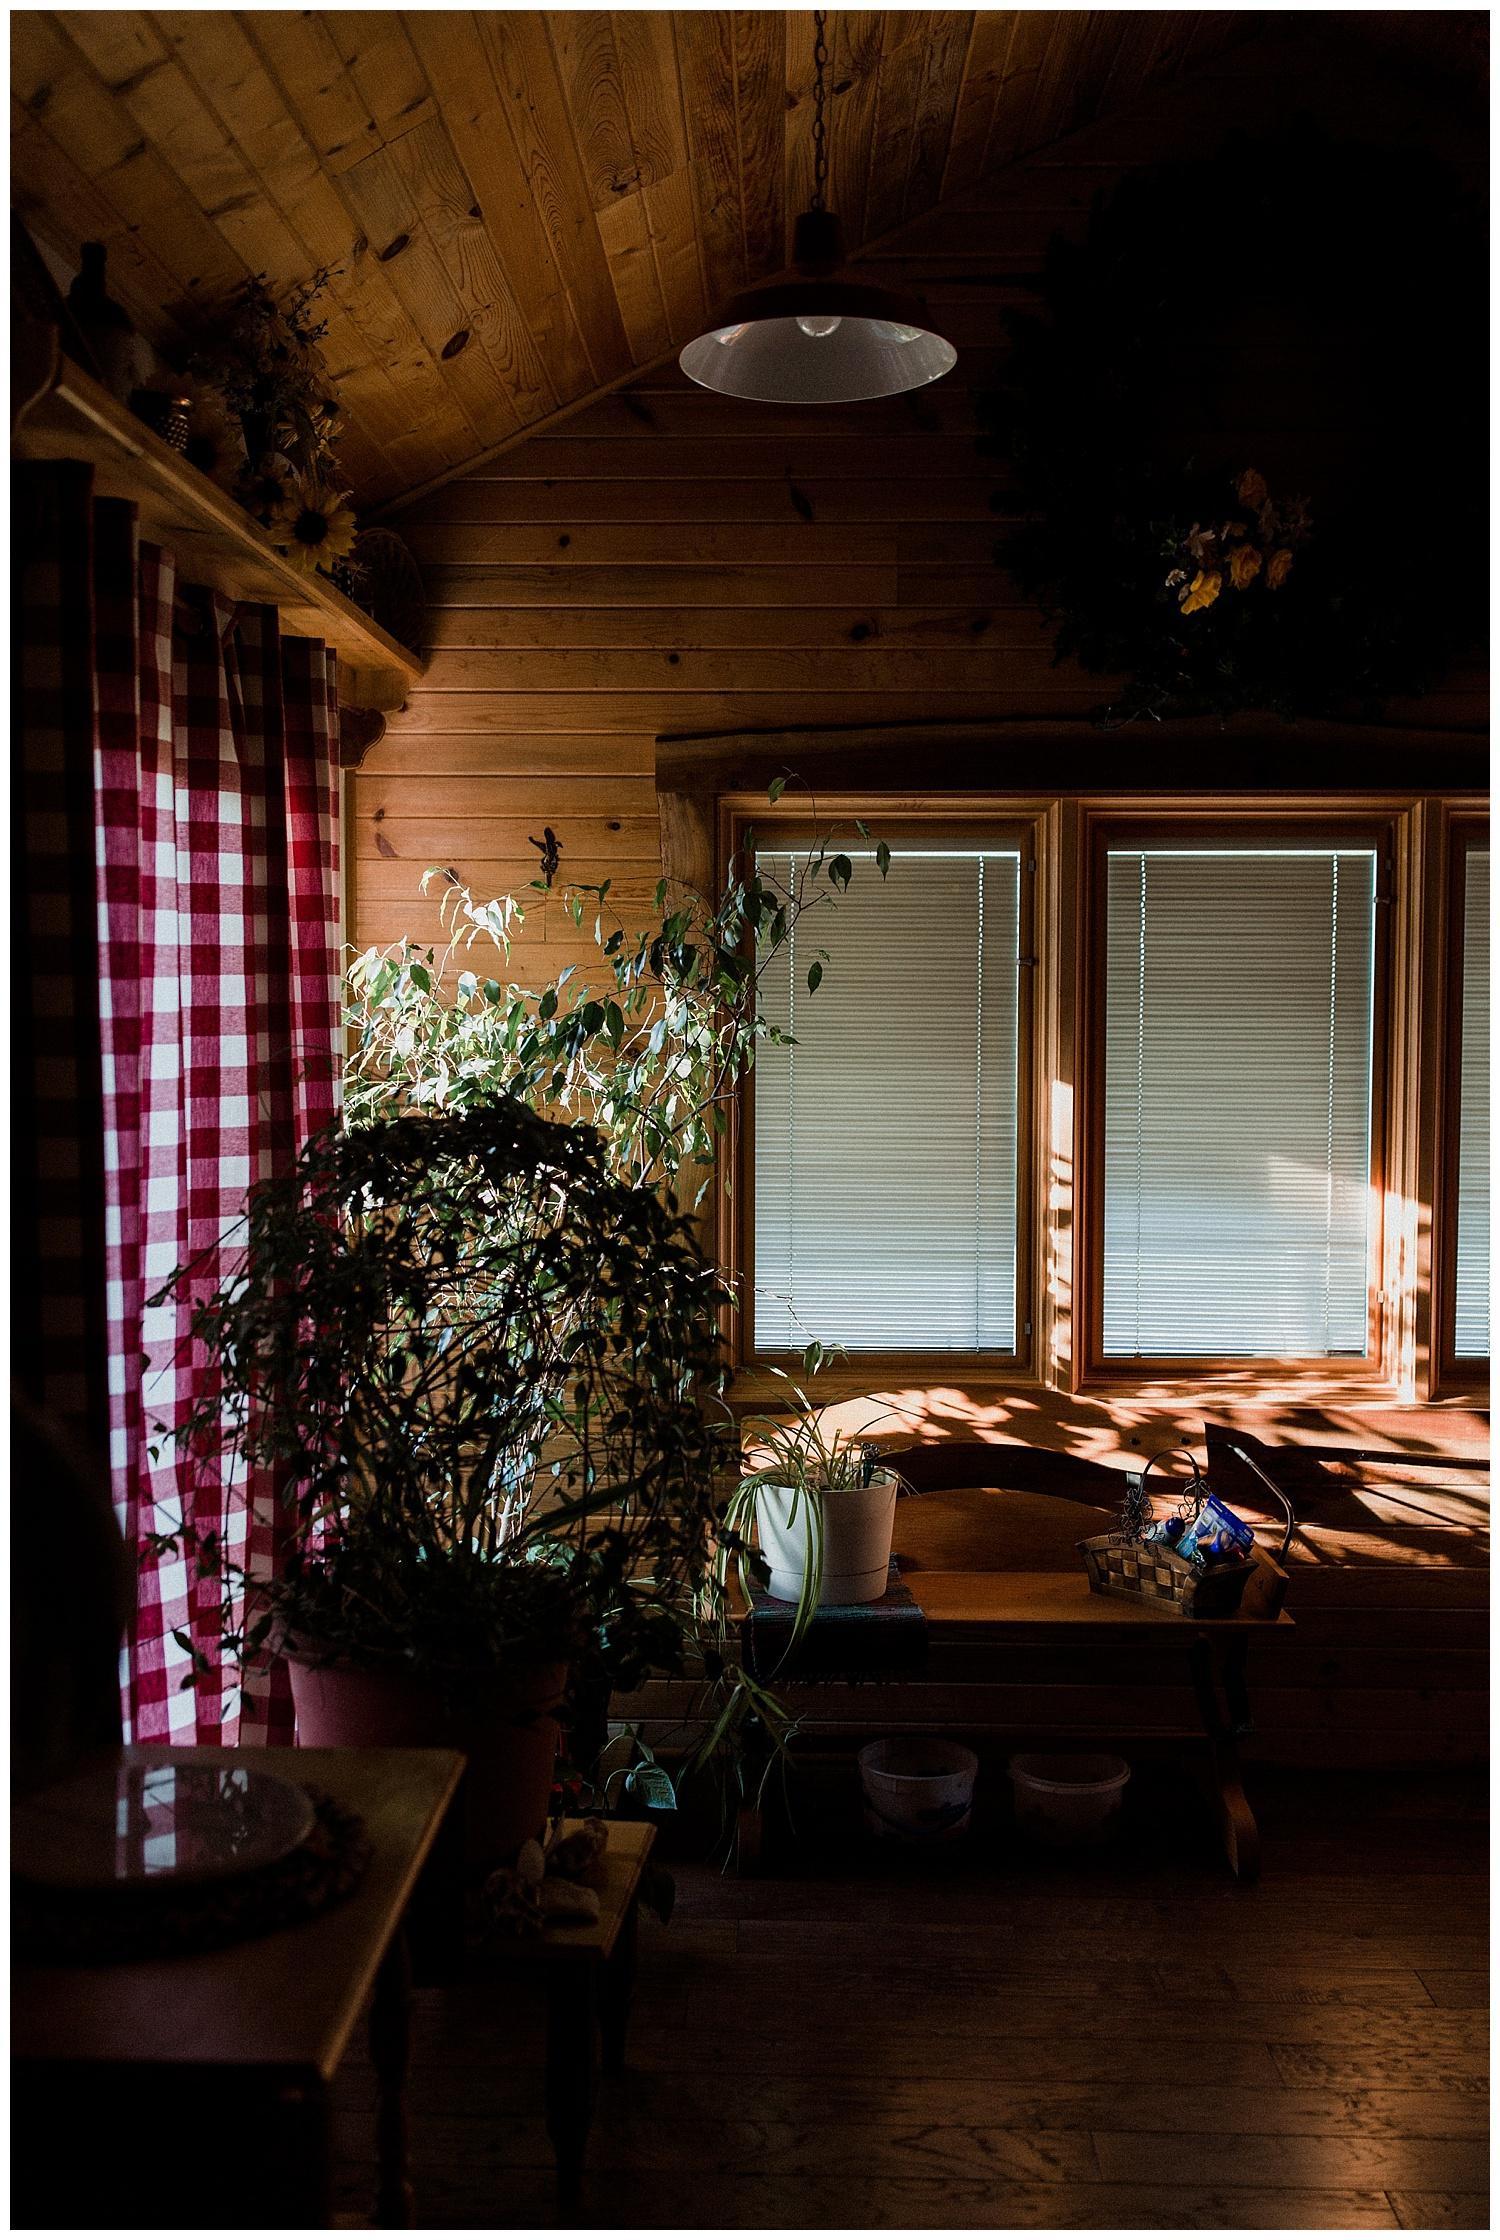 nebraska_cabin_engagement_session_wedding_photographer_adventure_0027.jpg